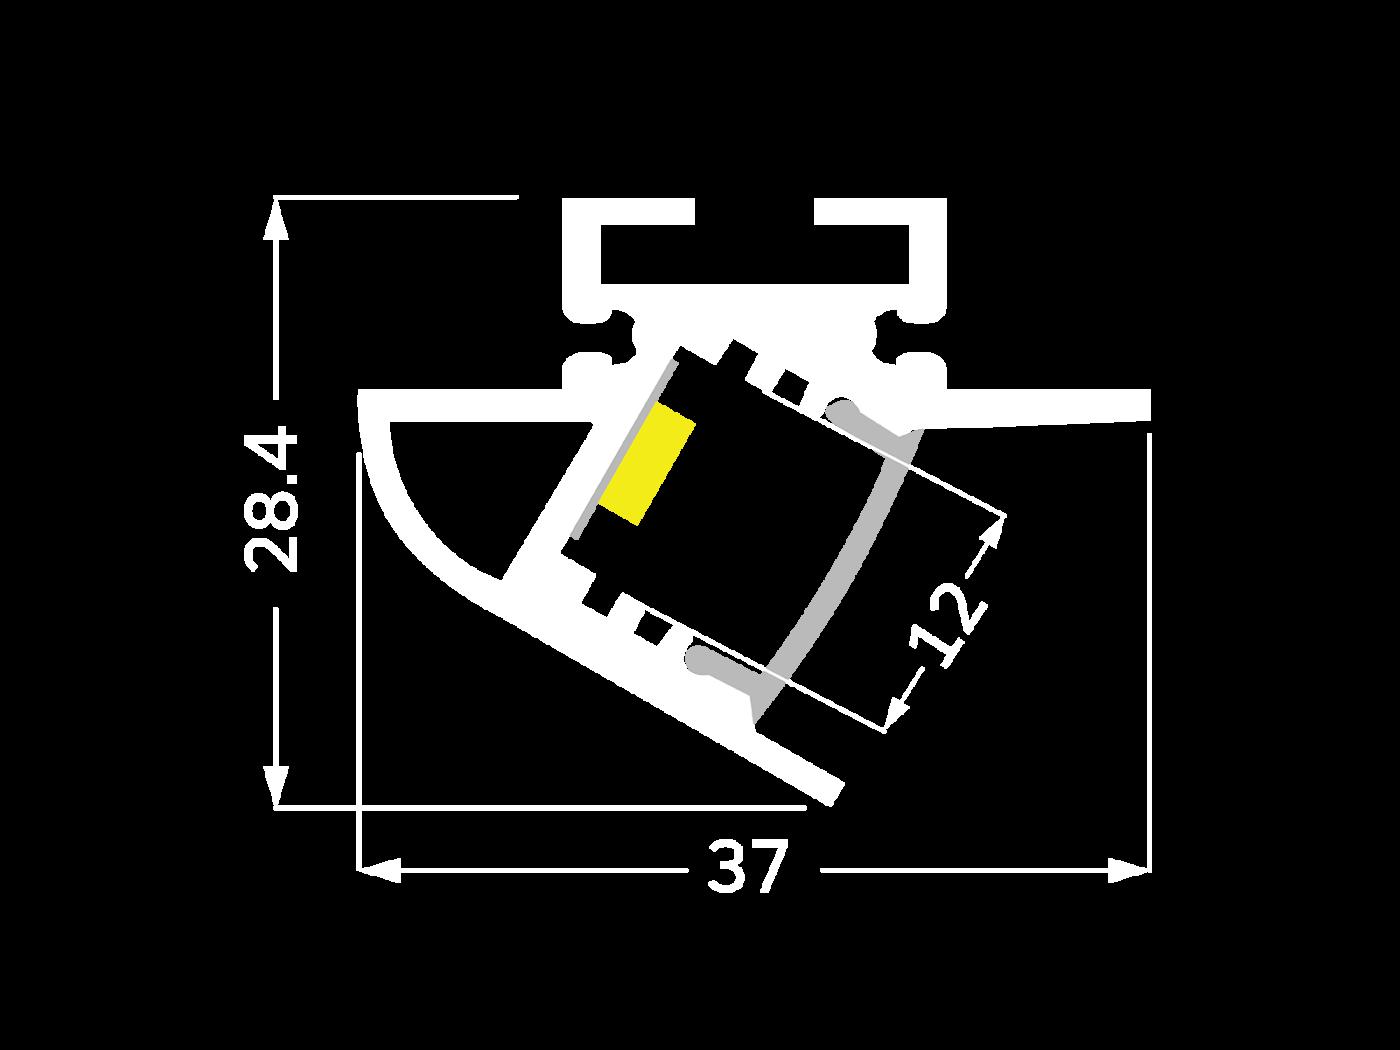 Diagram_Brixton_1600x1200